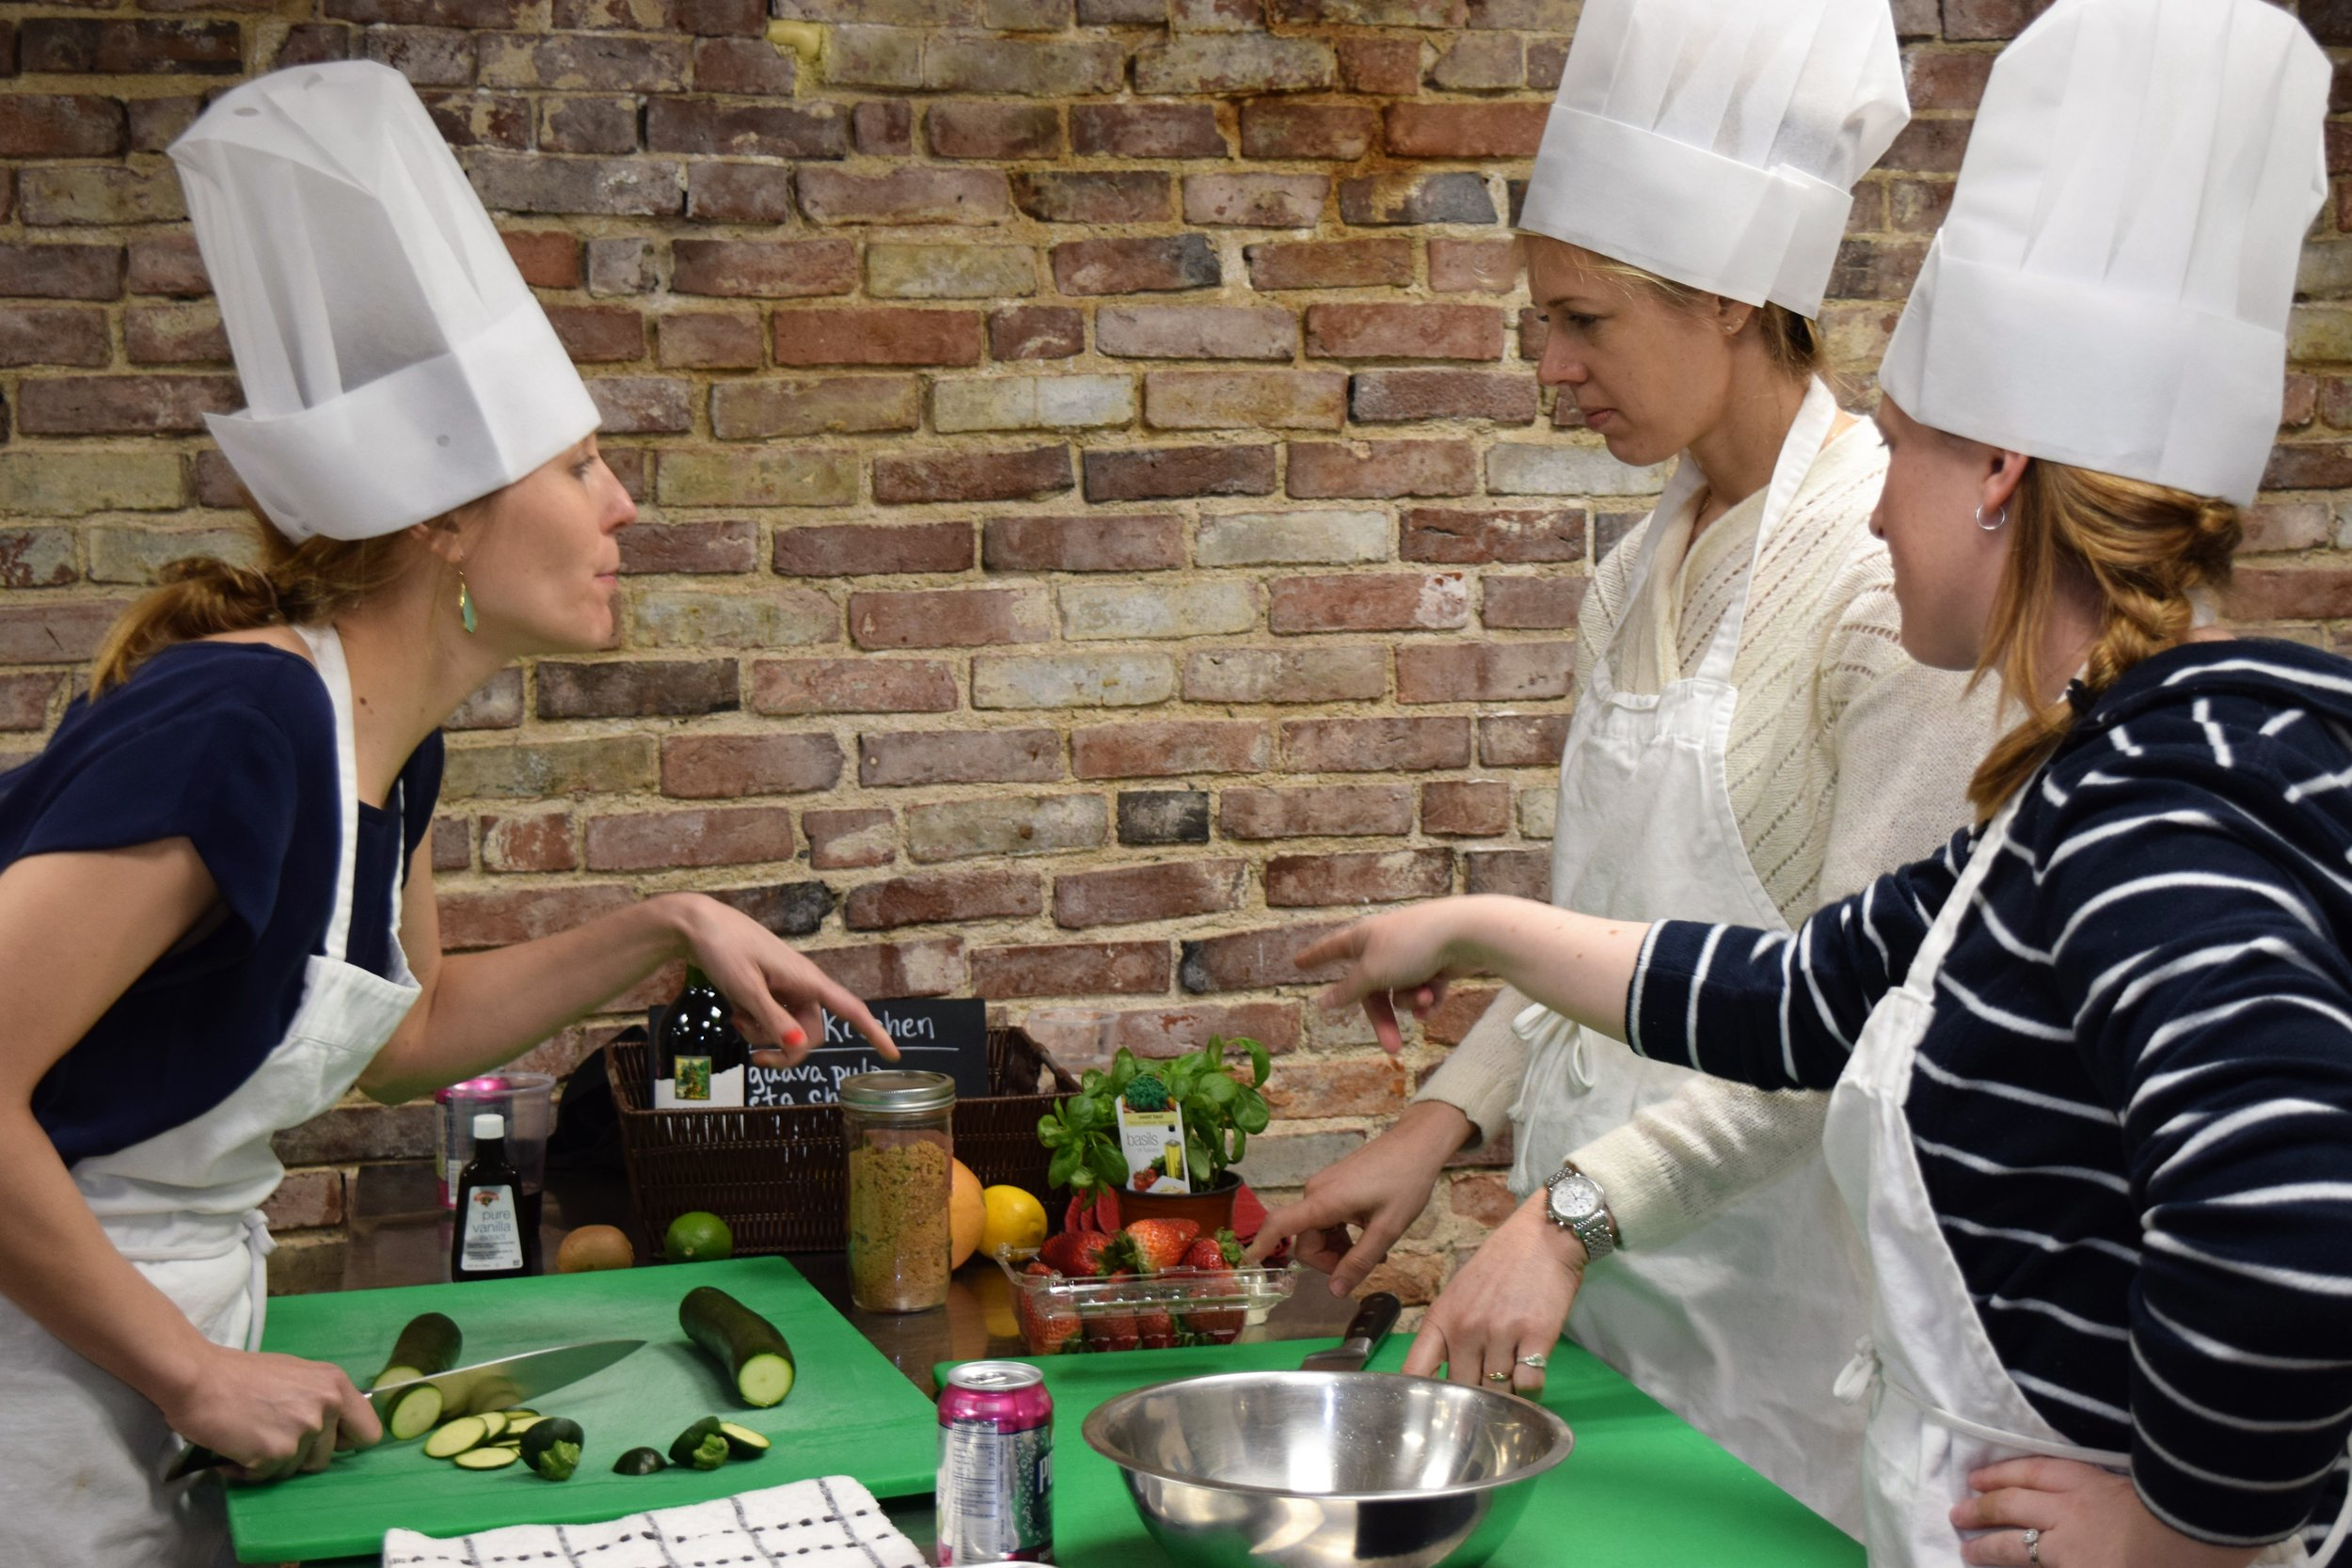 Bachelorette cooking competition dessert teamwork